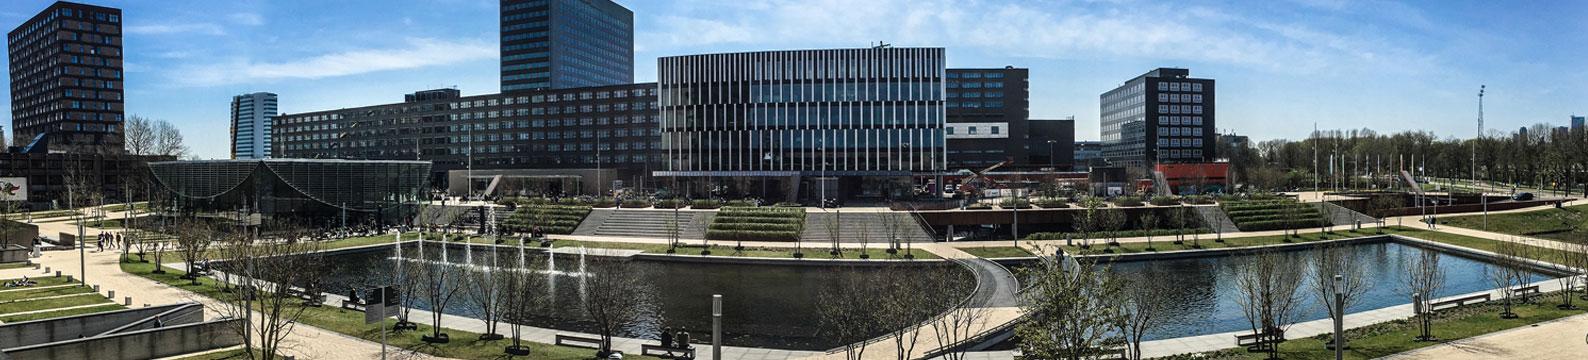 Foute Kersttrui Rotterdam.欢迎访问鹿特丹管理学院中文官网 Rotterdam School Of Management